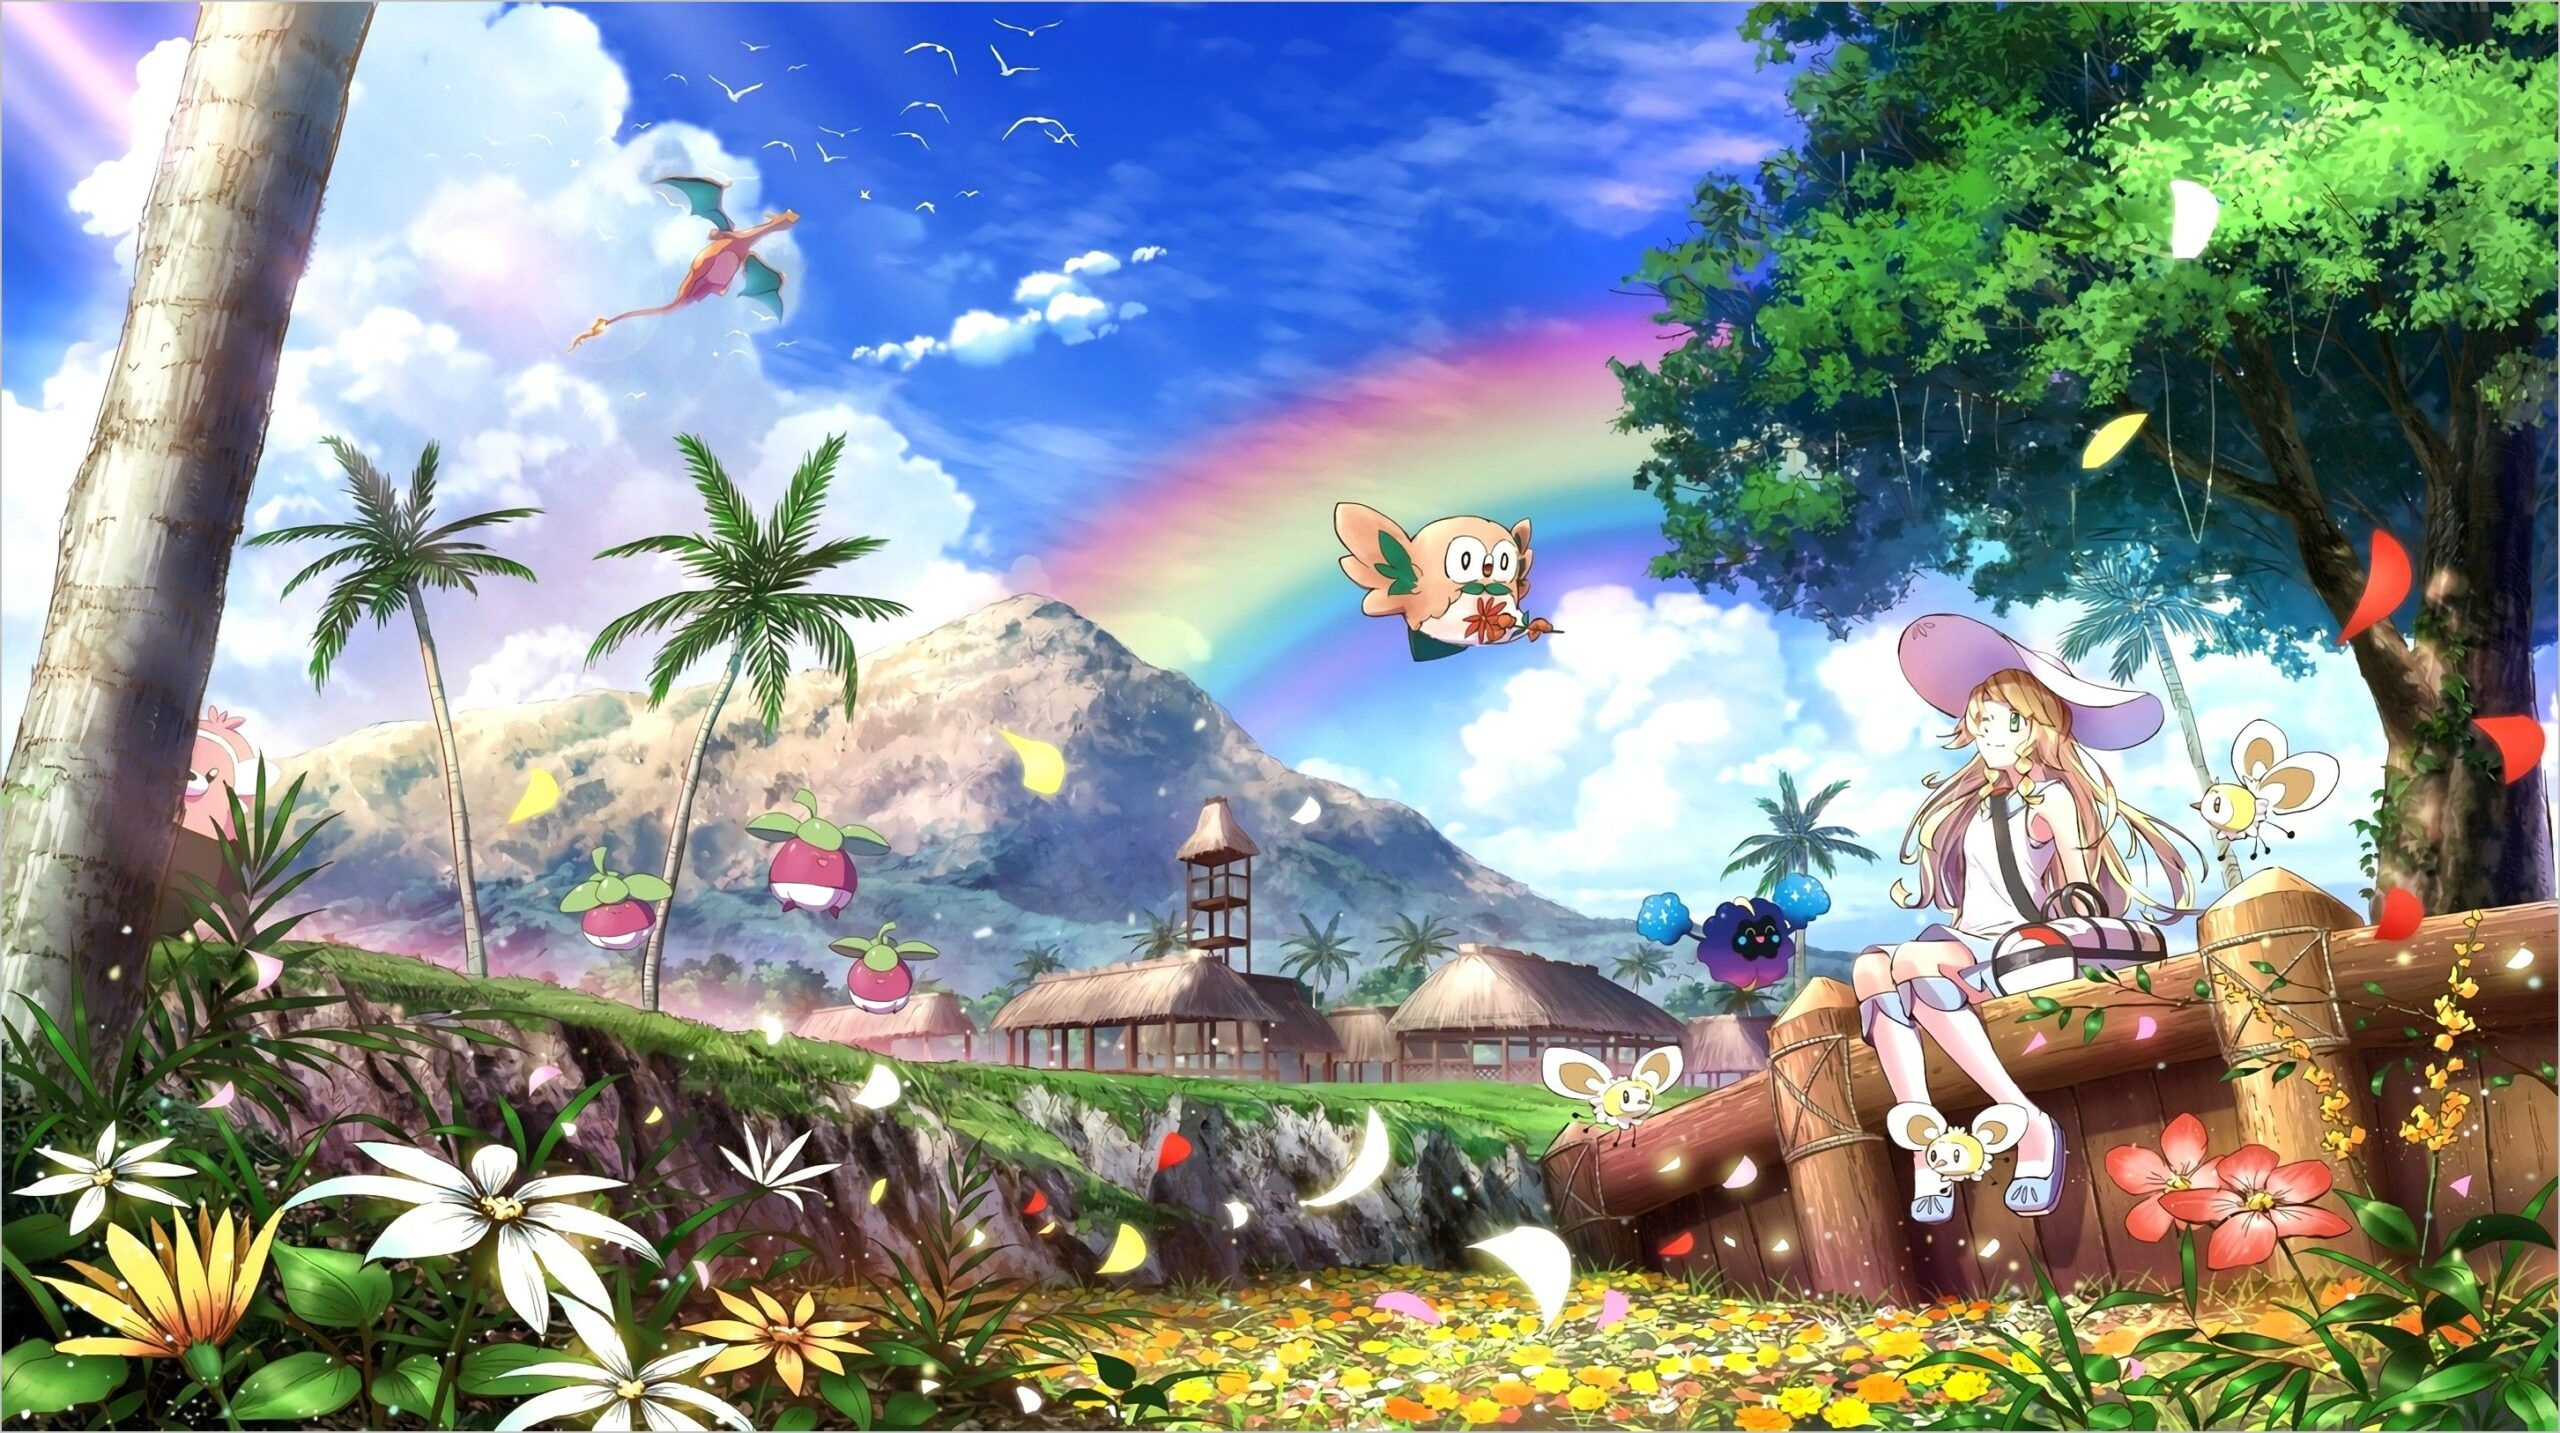 Pokemonsun And Moon 4k Wallpaper In 2020 Pokemon Sun Pokemon Anime Wallpaper